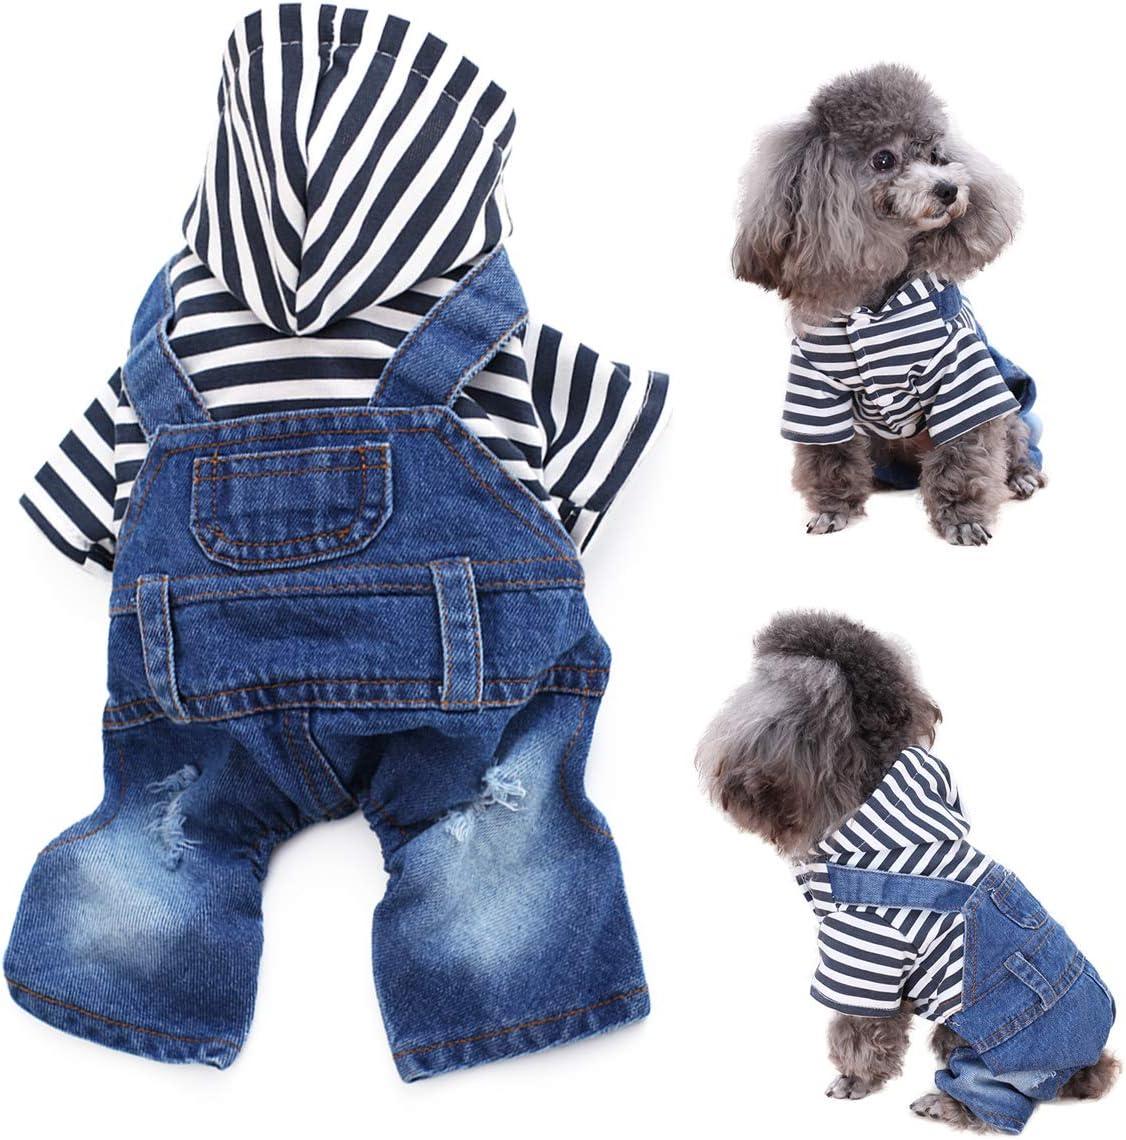 LKEX Under blast sales Pet Clothes Jumpsuit Japan Maker New Dog Jeans Jacket B Shirt Cool Puppy